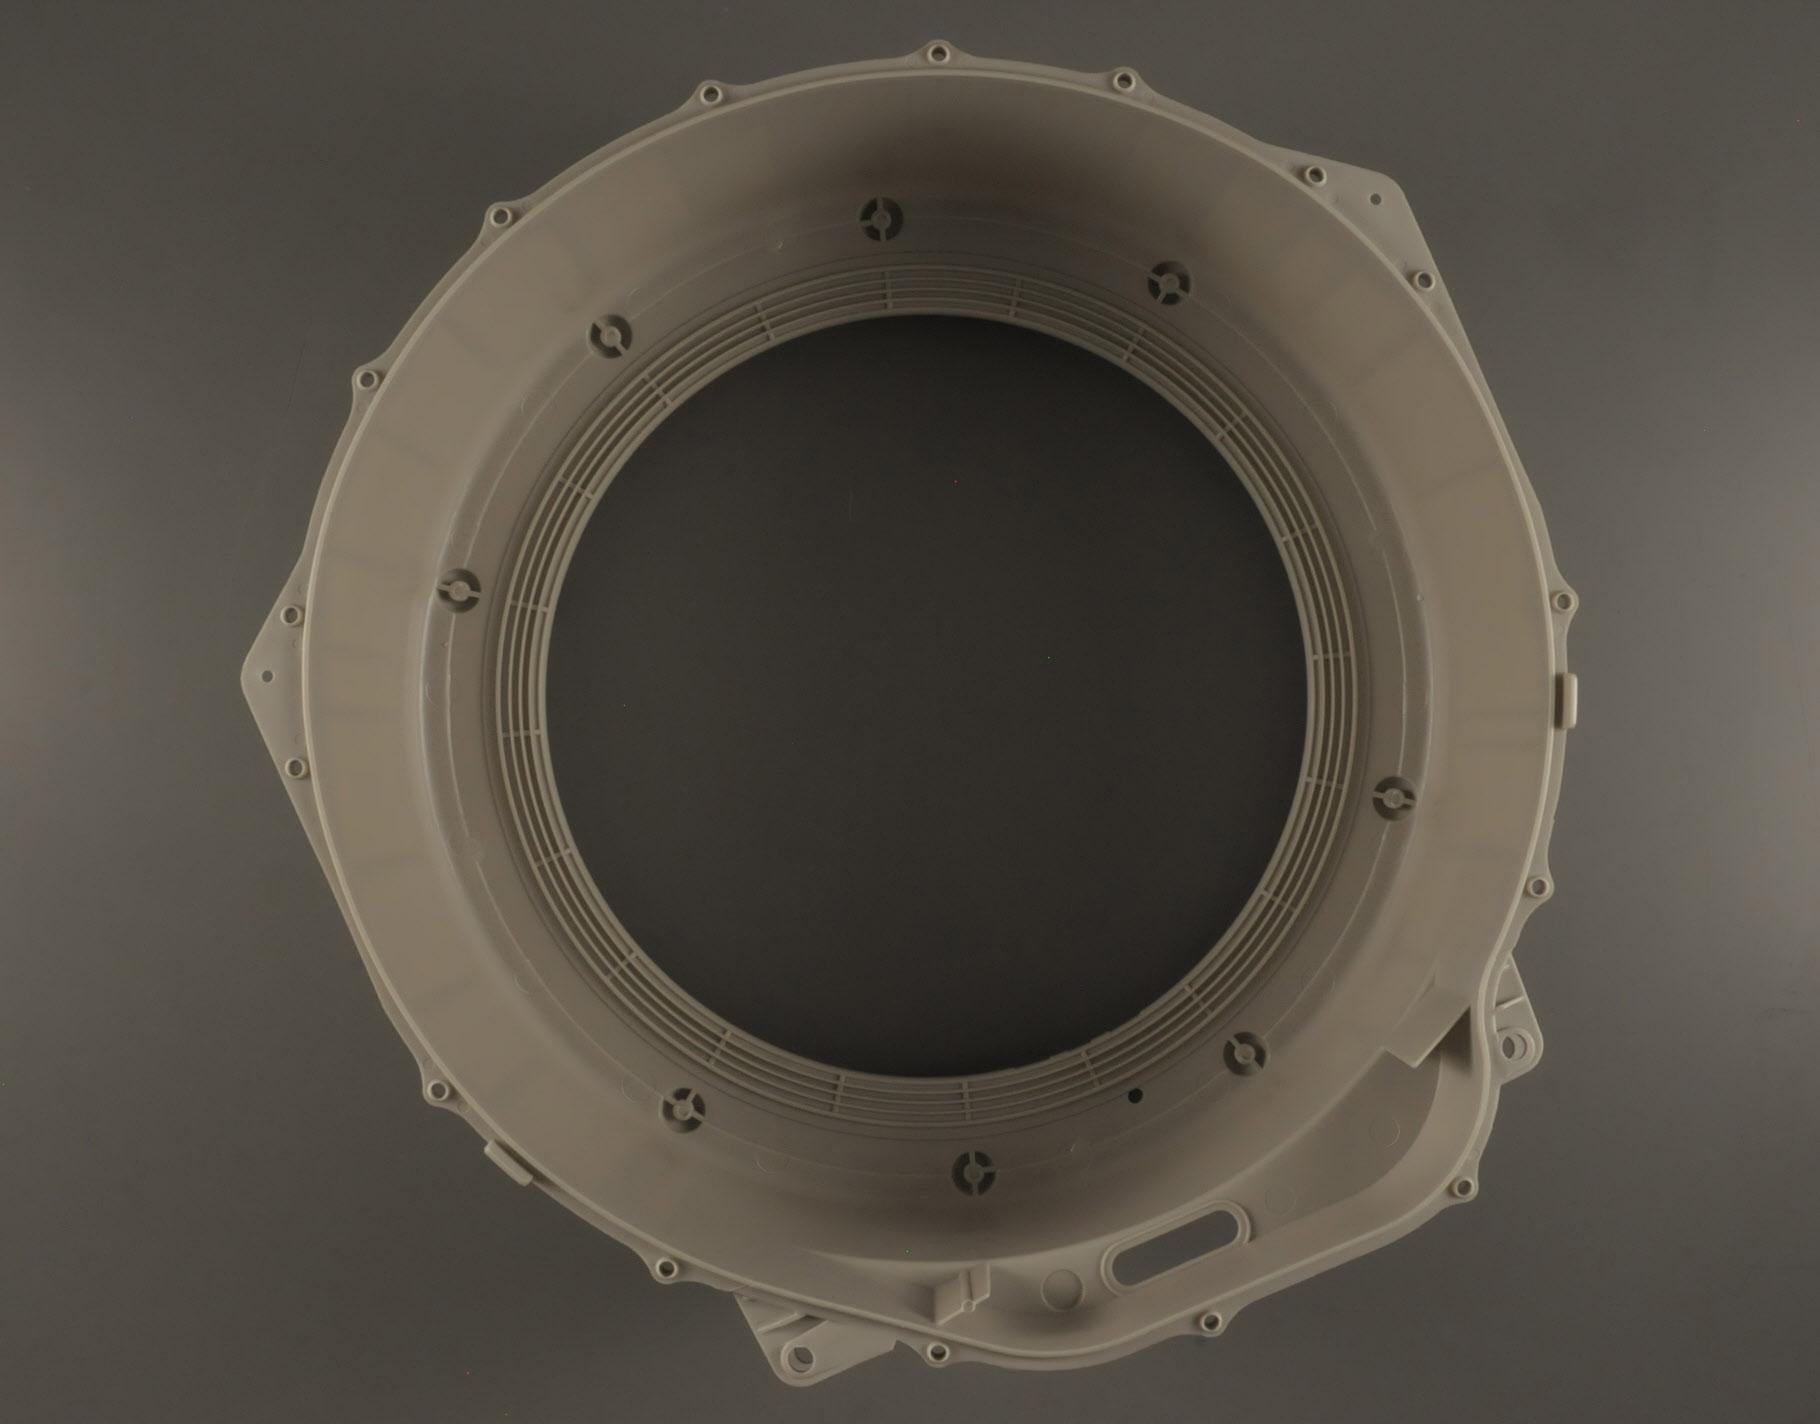 LG Washing Machine Part # 3550ER0004H - Front Drum Assembly